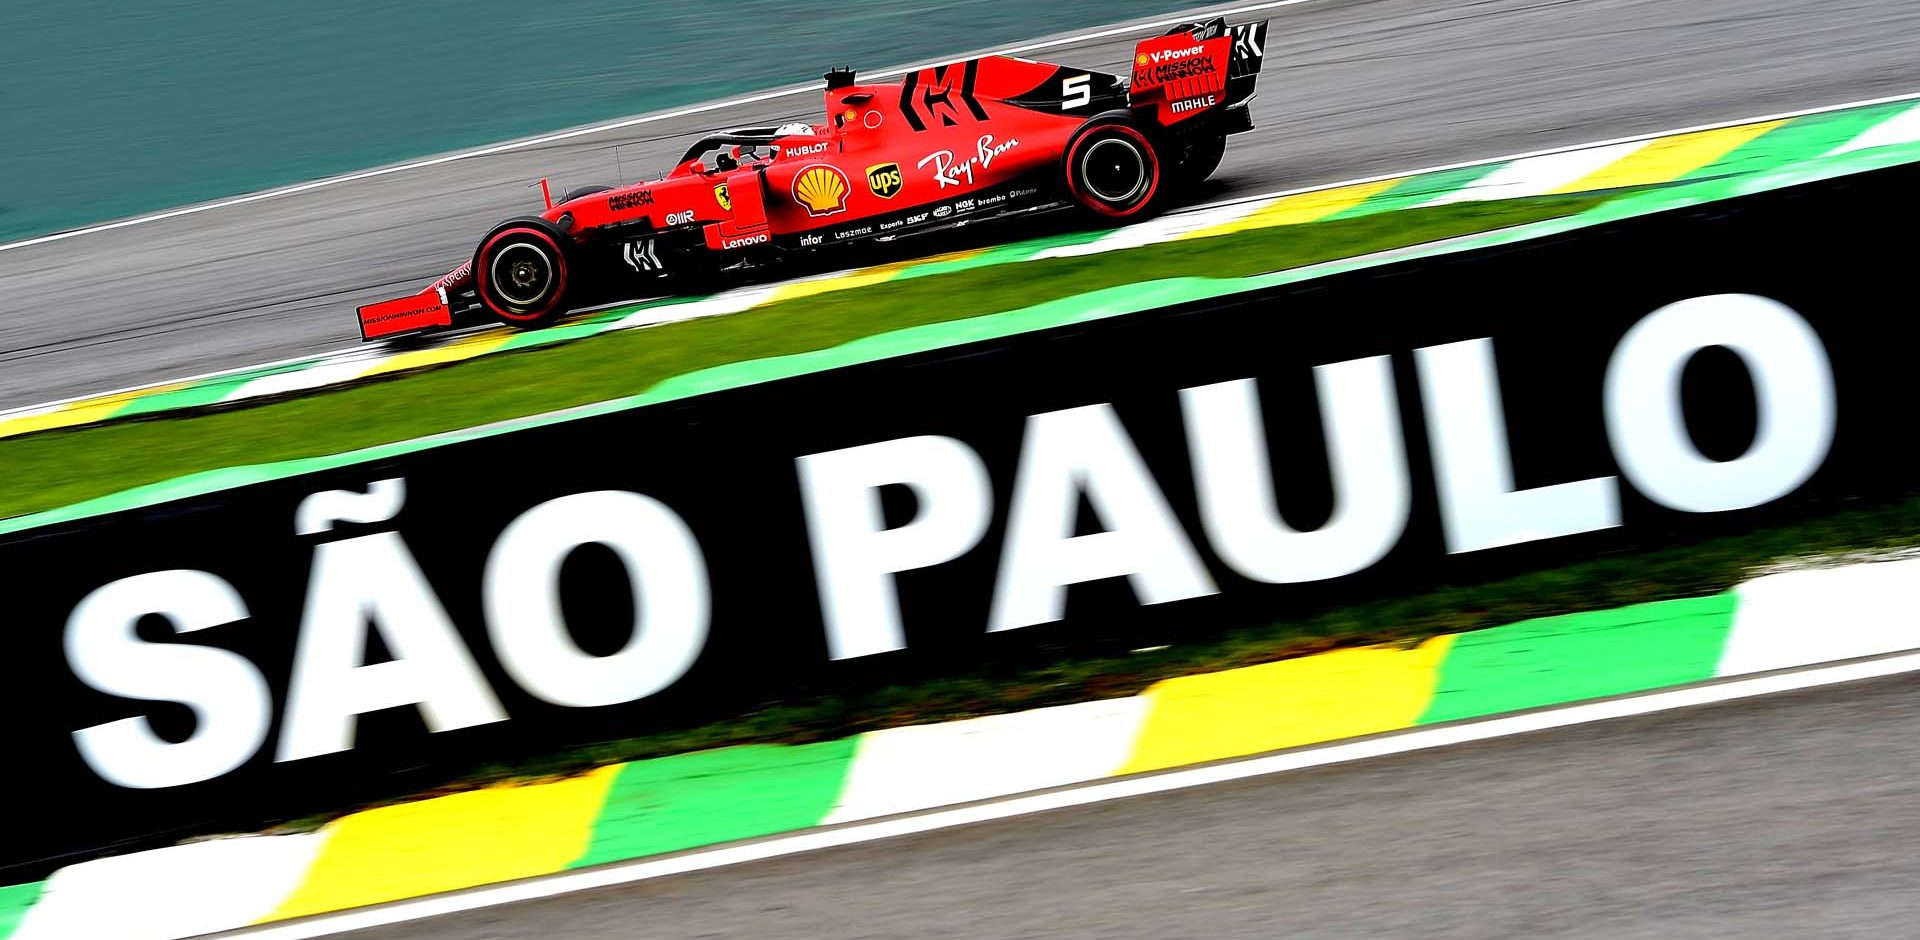 GP BRASILE  F1/2019 -  SABATO  16/11/2019   credit: @Scuderia Ferrari Press Office